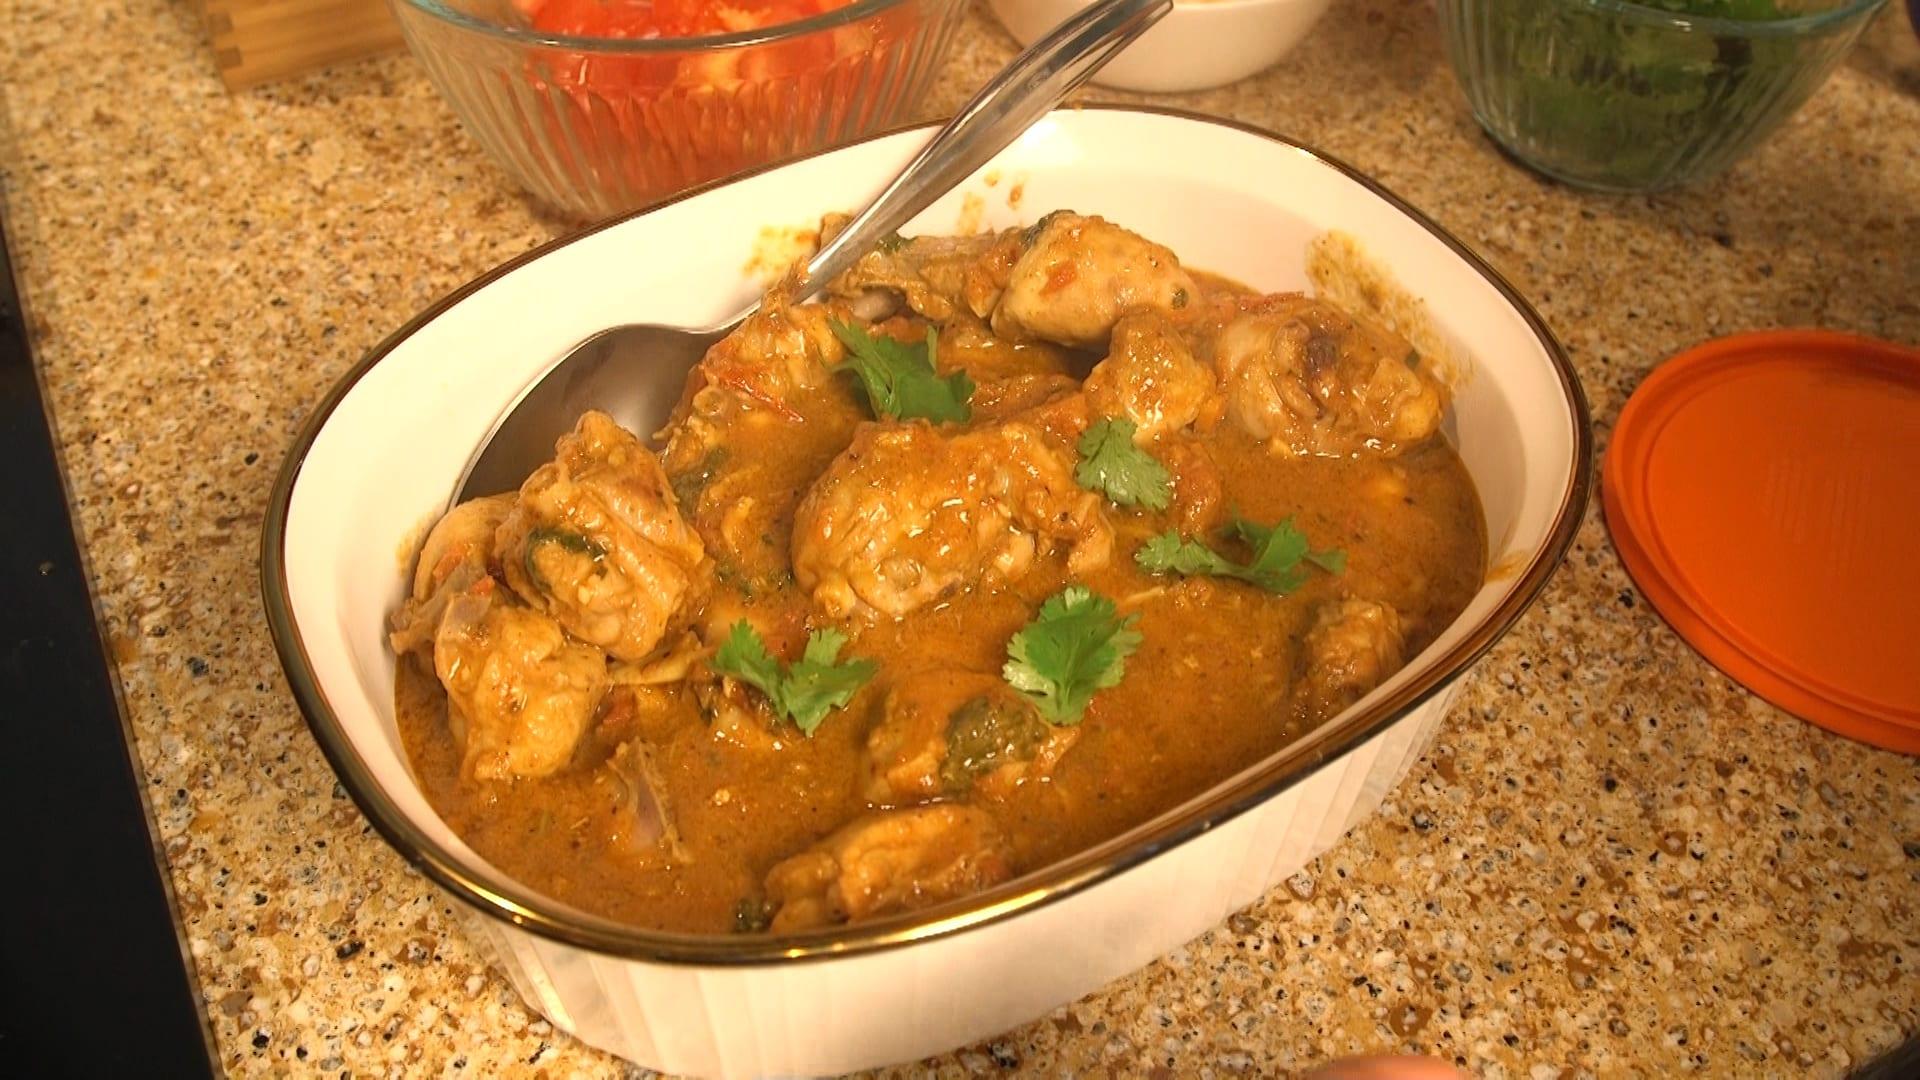 A dish of chicken karahi